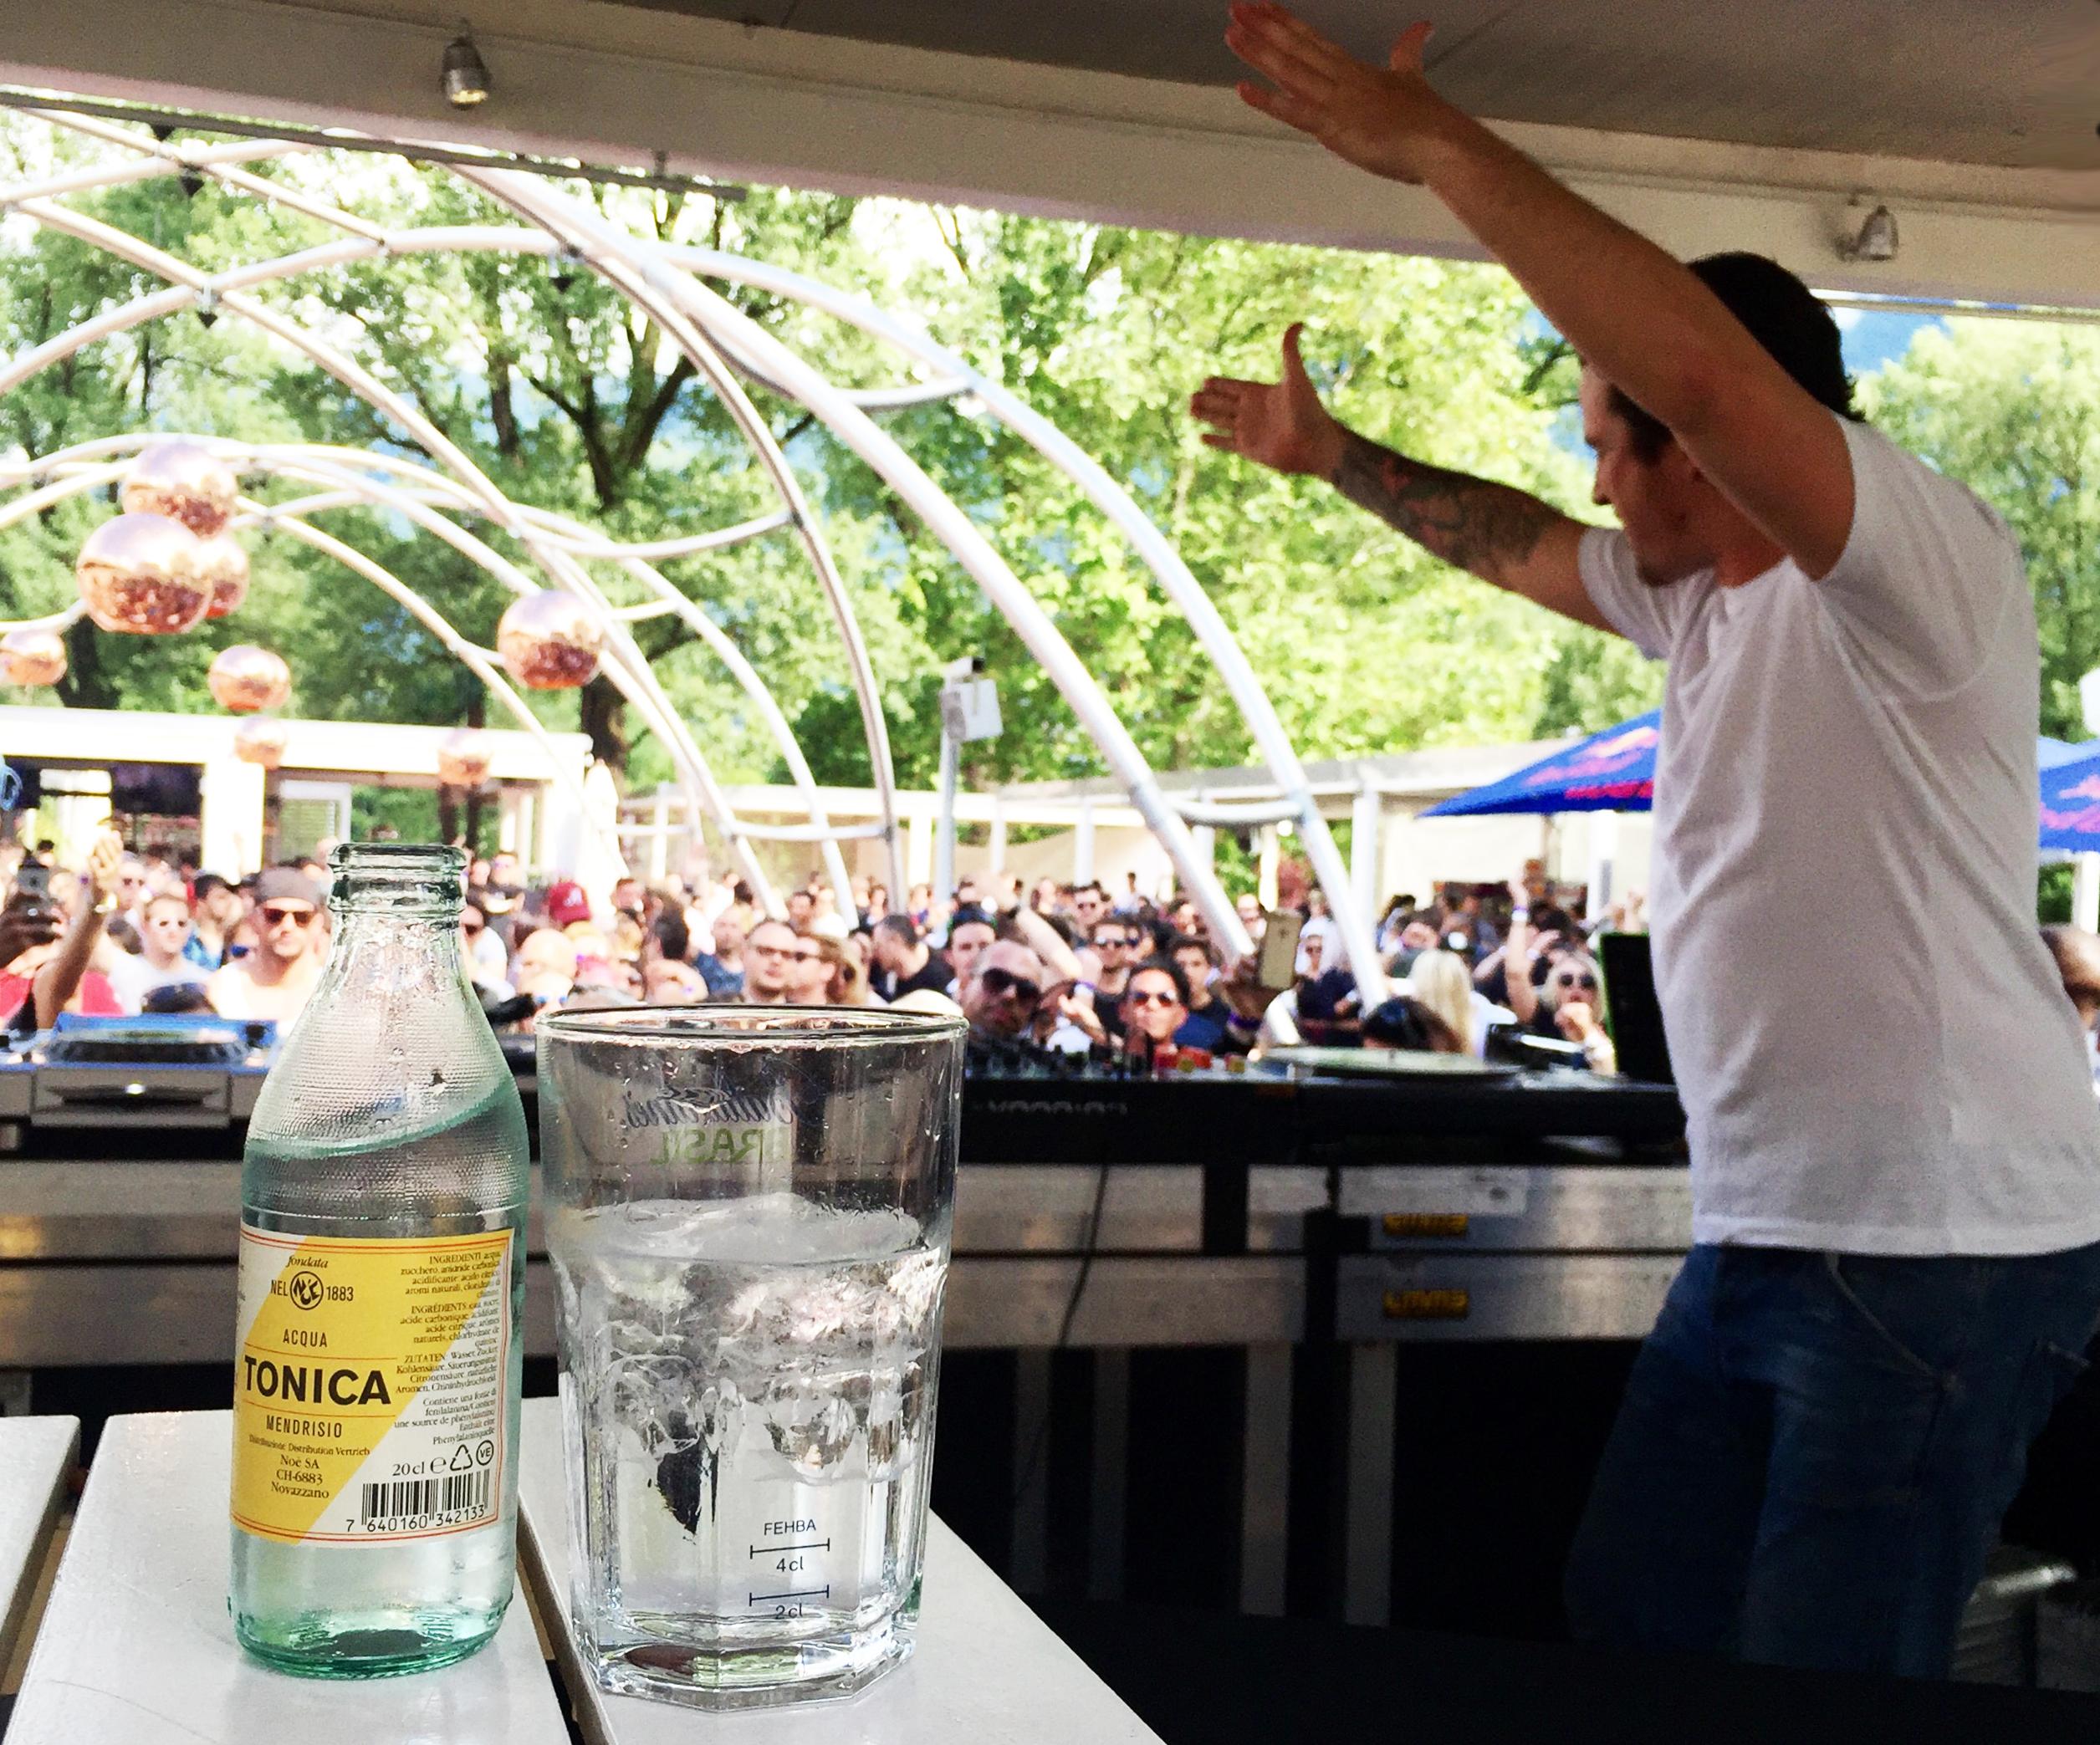 luciano _ fair live